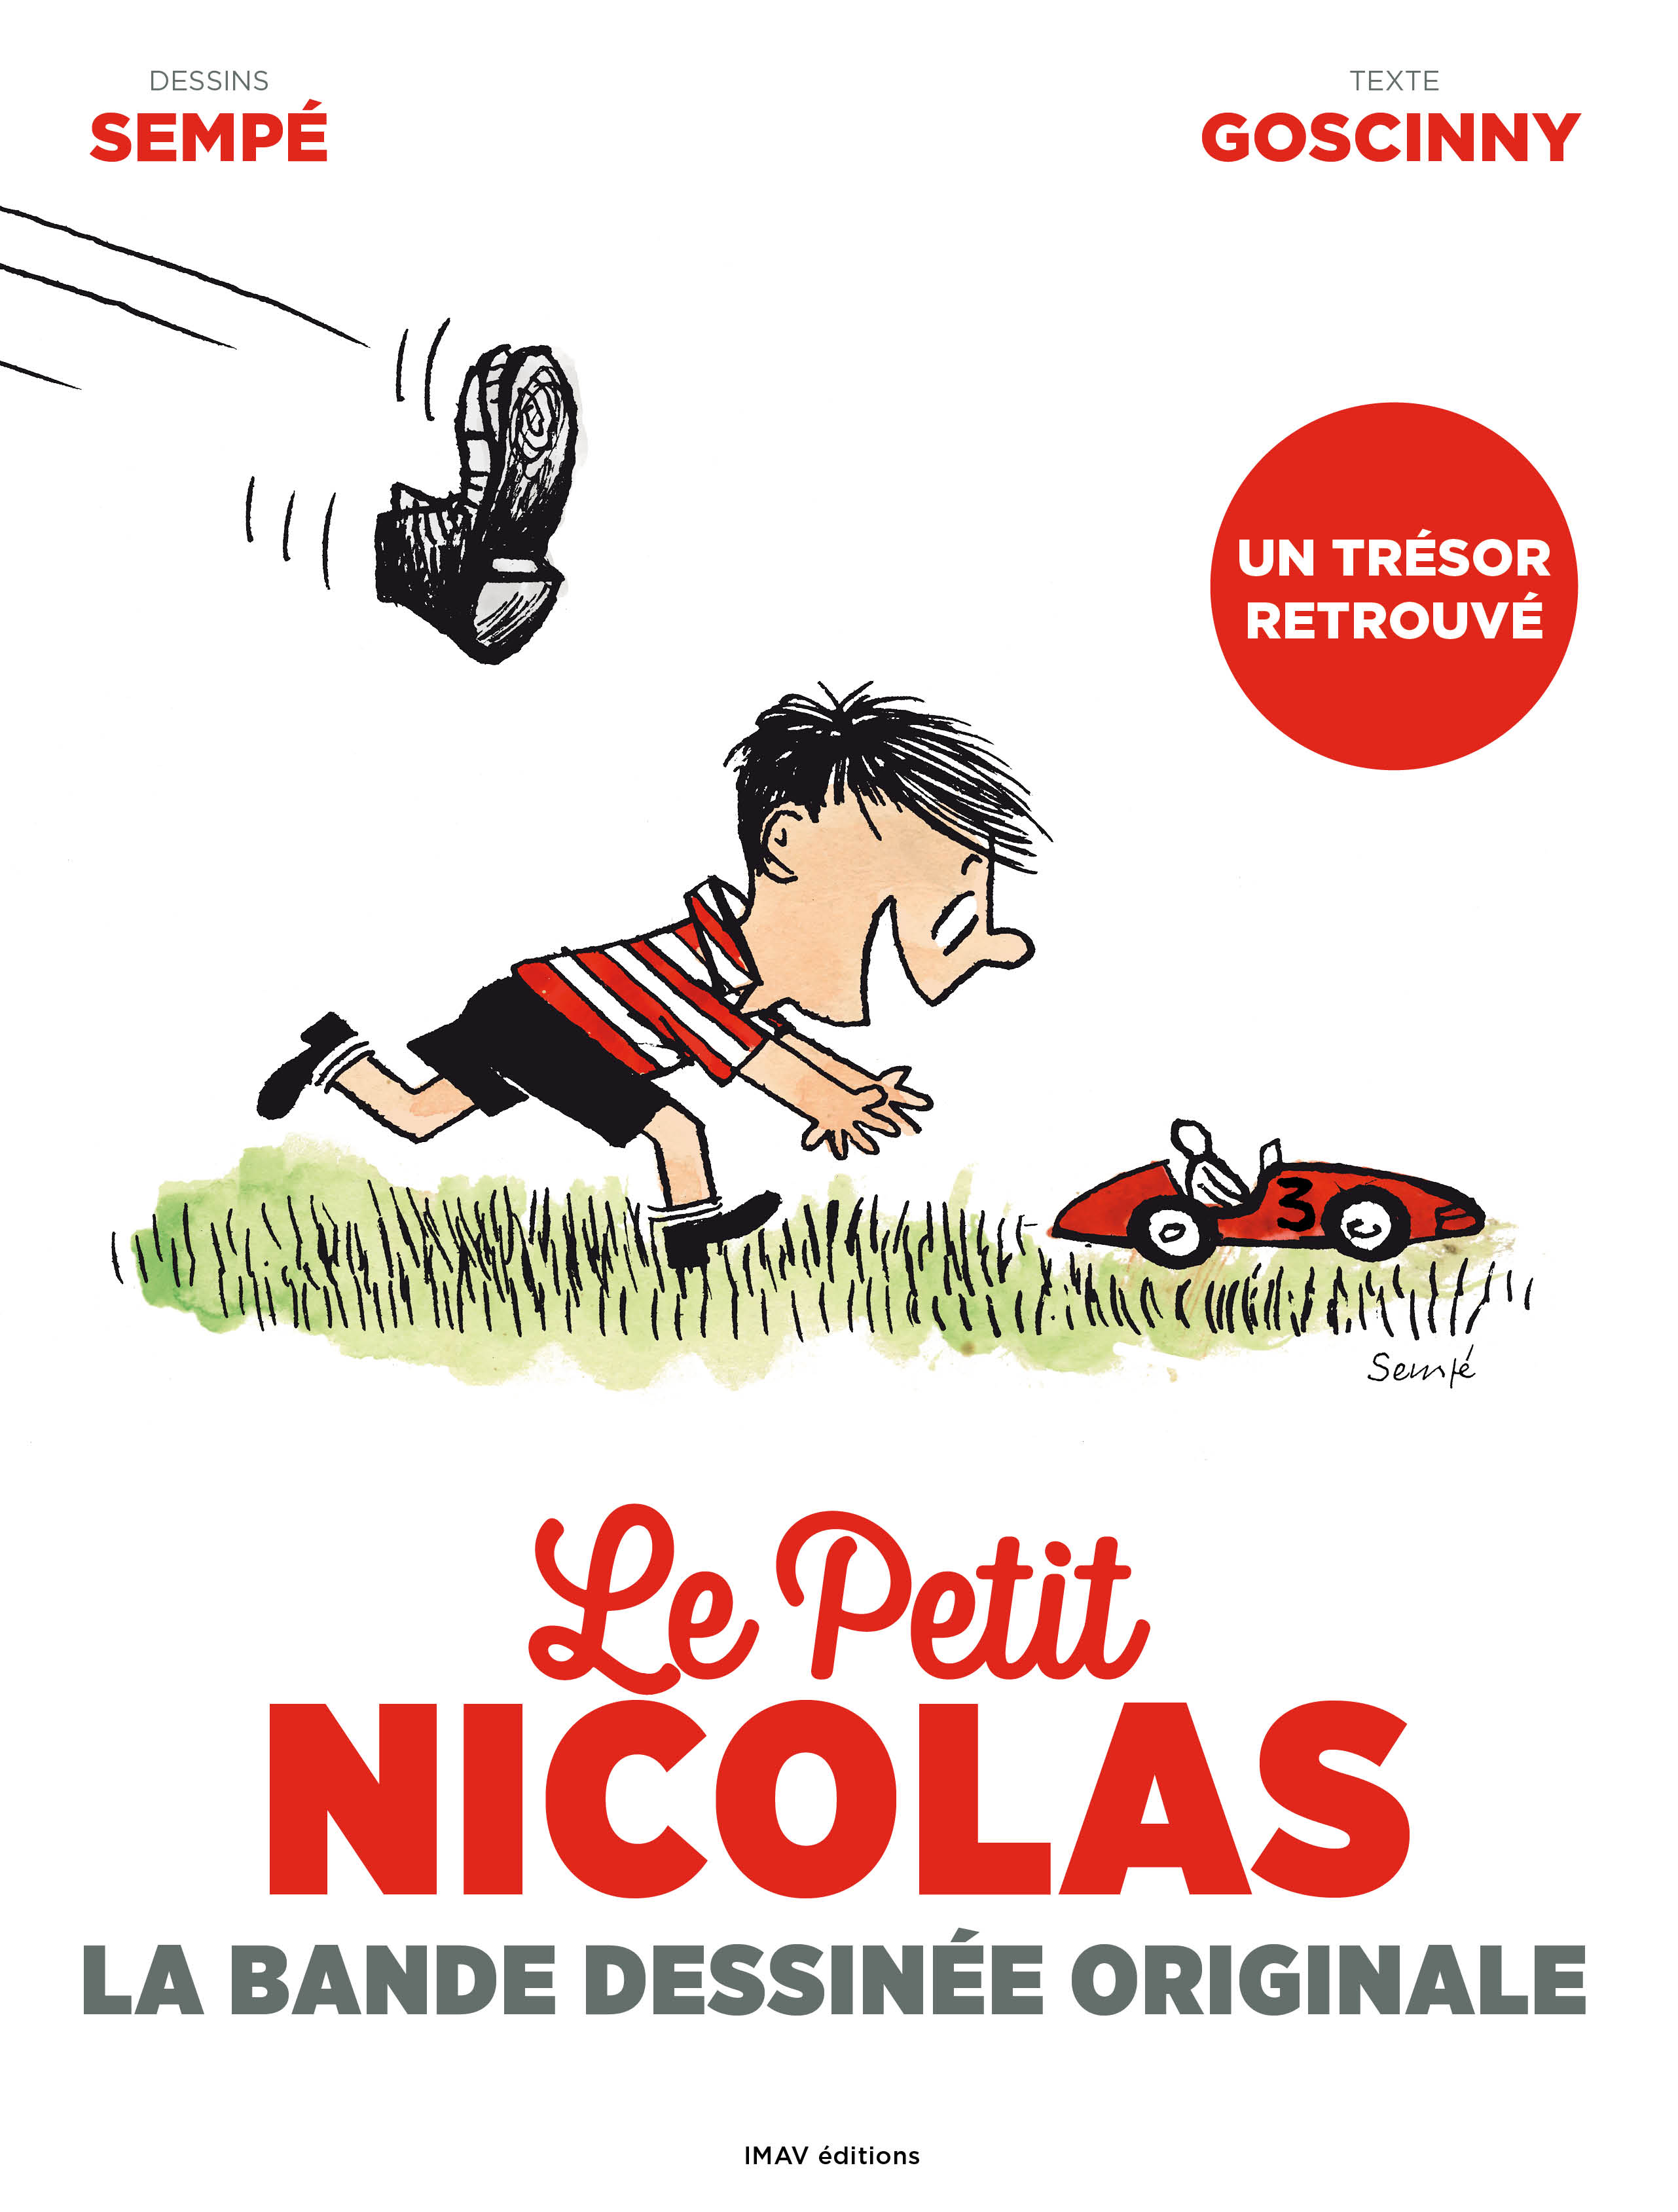 couv-le-petit-nicolas-la-bande-dessinee-598976cbdd1c5